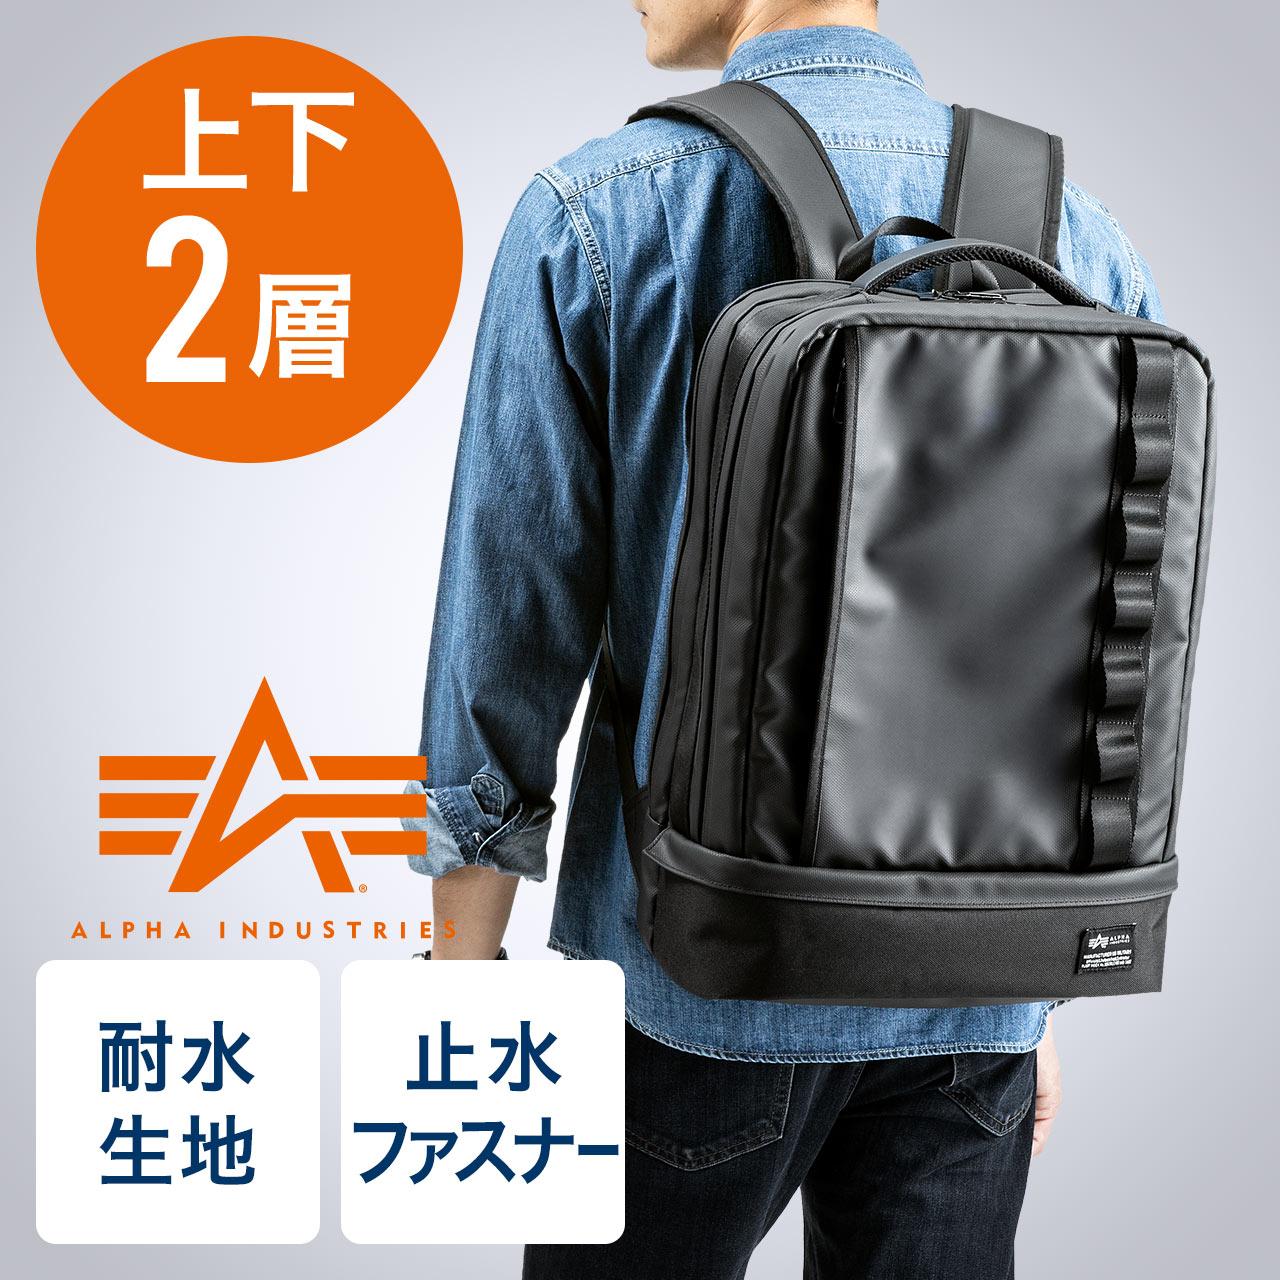 8e358c38612a リュック・バックパック(アルファ・2層式・靴/弁当収納・通学/通勤・A4... 価格¥6,980